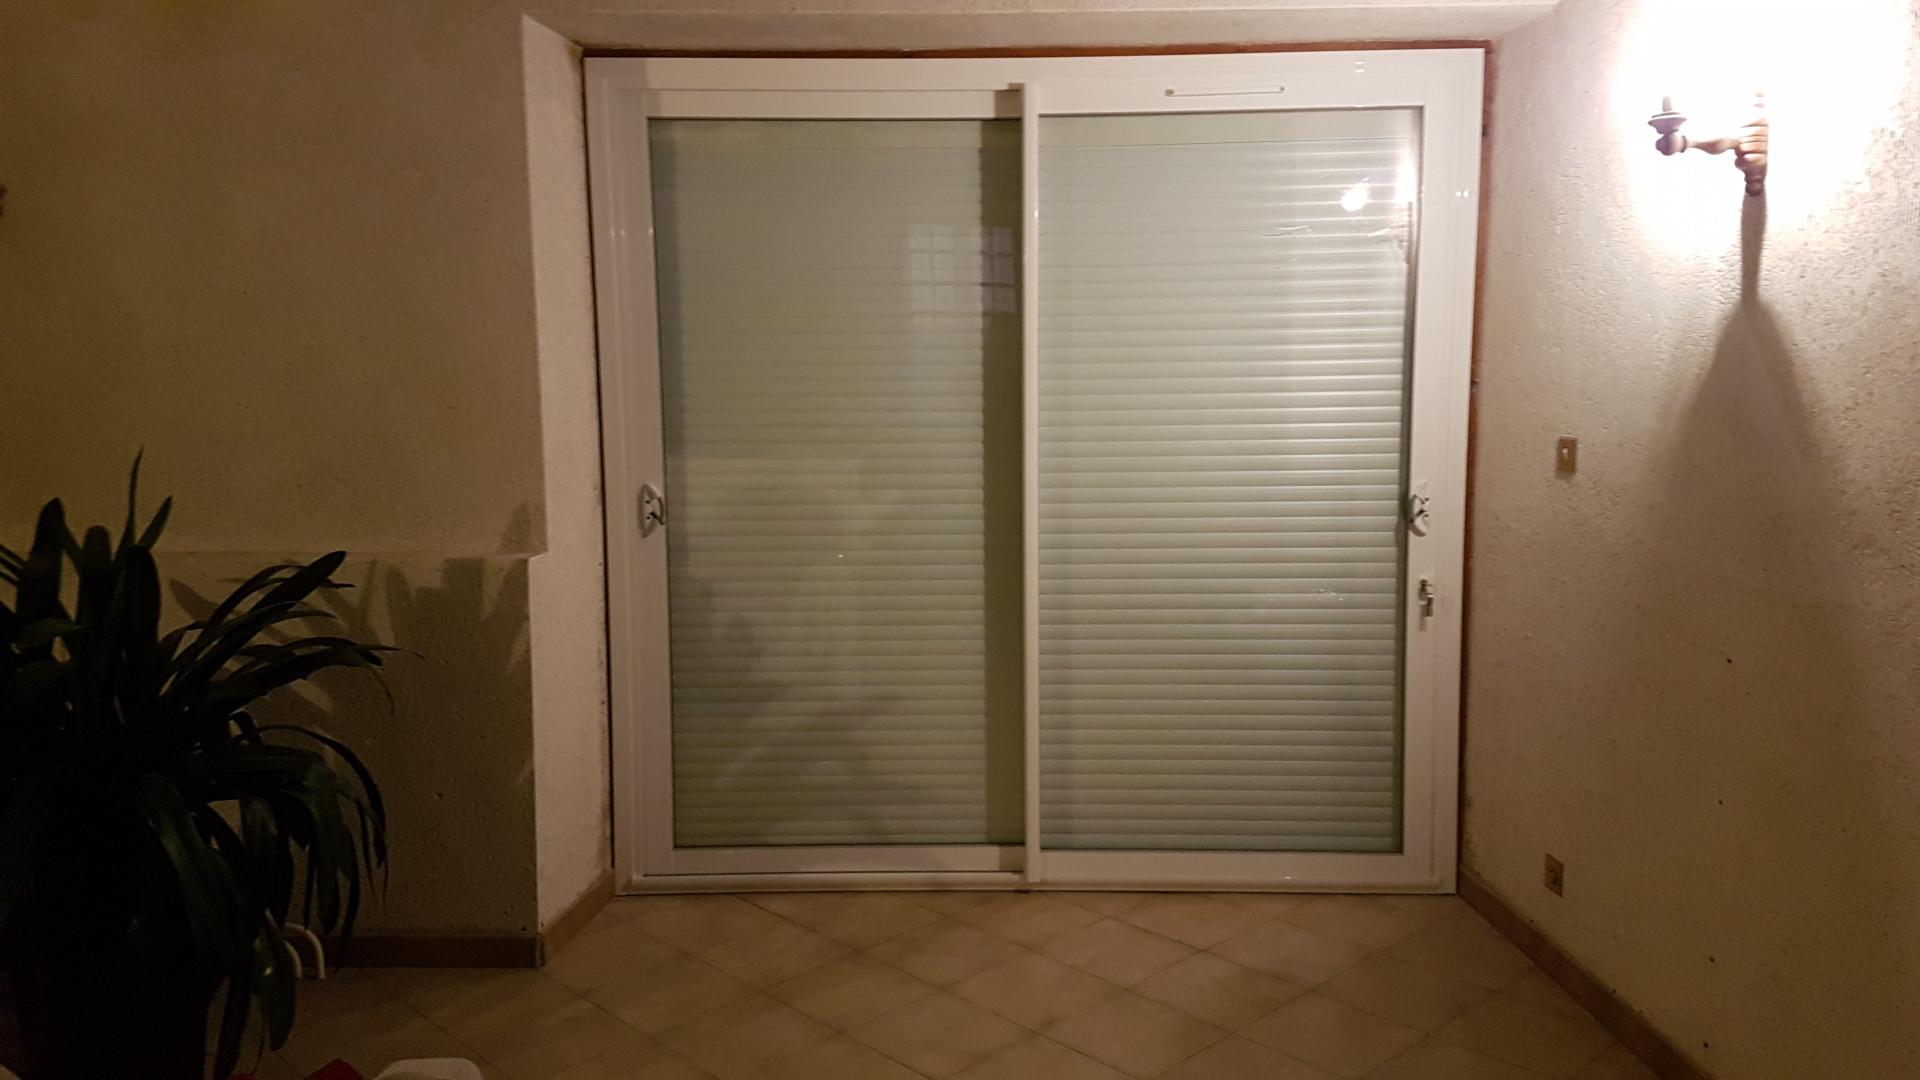 baie vitrée aluminium blanc